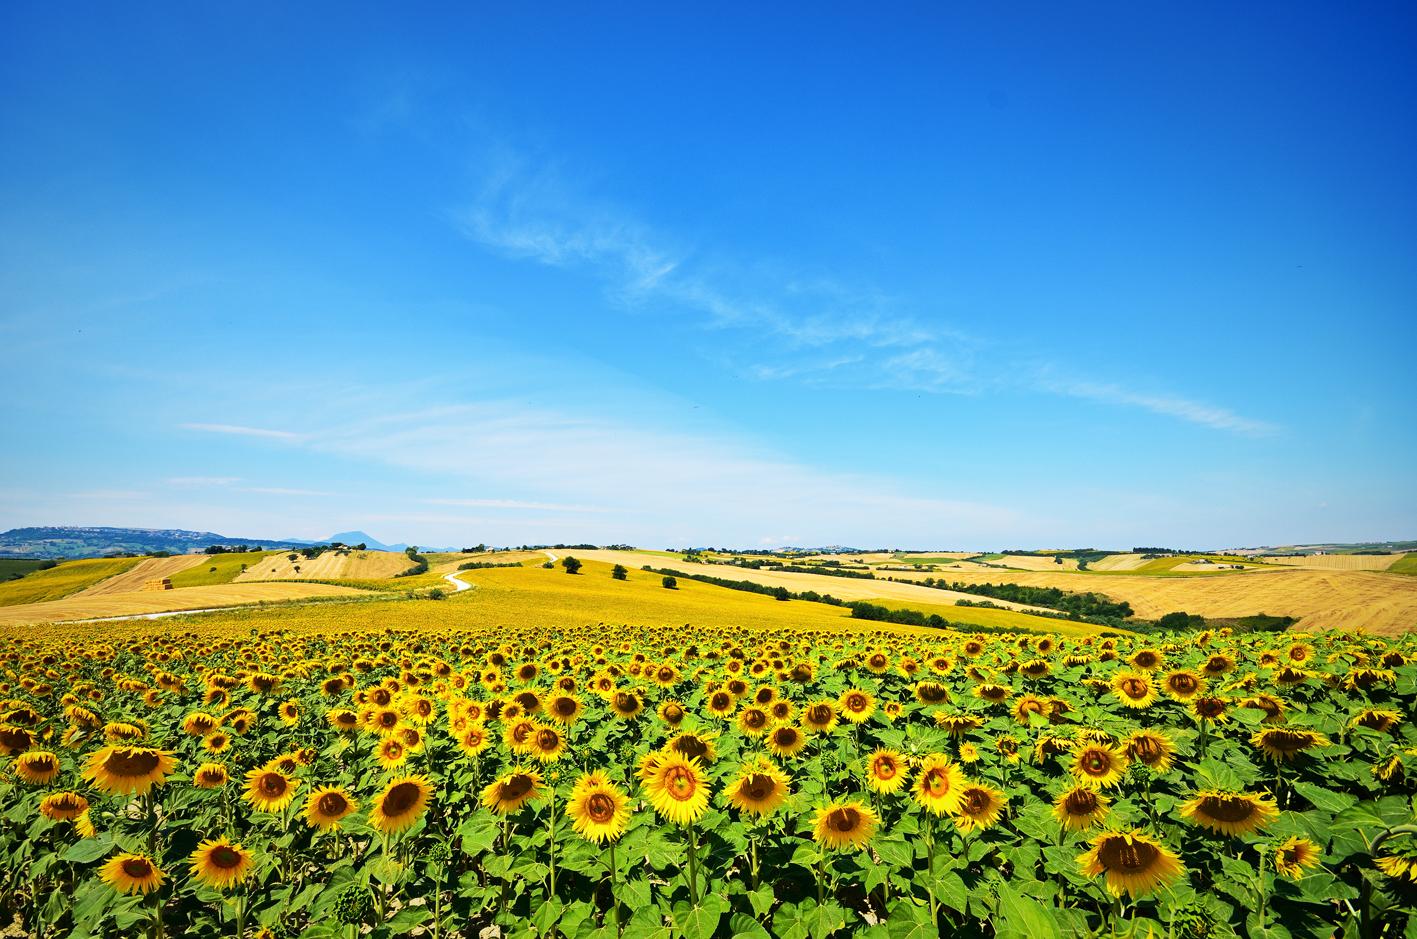 Borgo della Spiga - eine Nacht im Sonnenblumenfeld